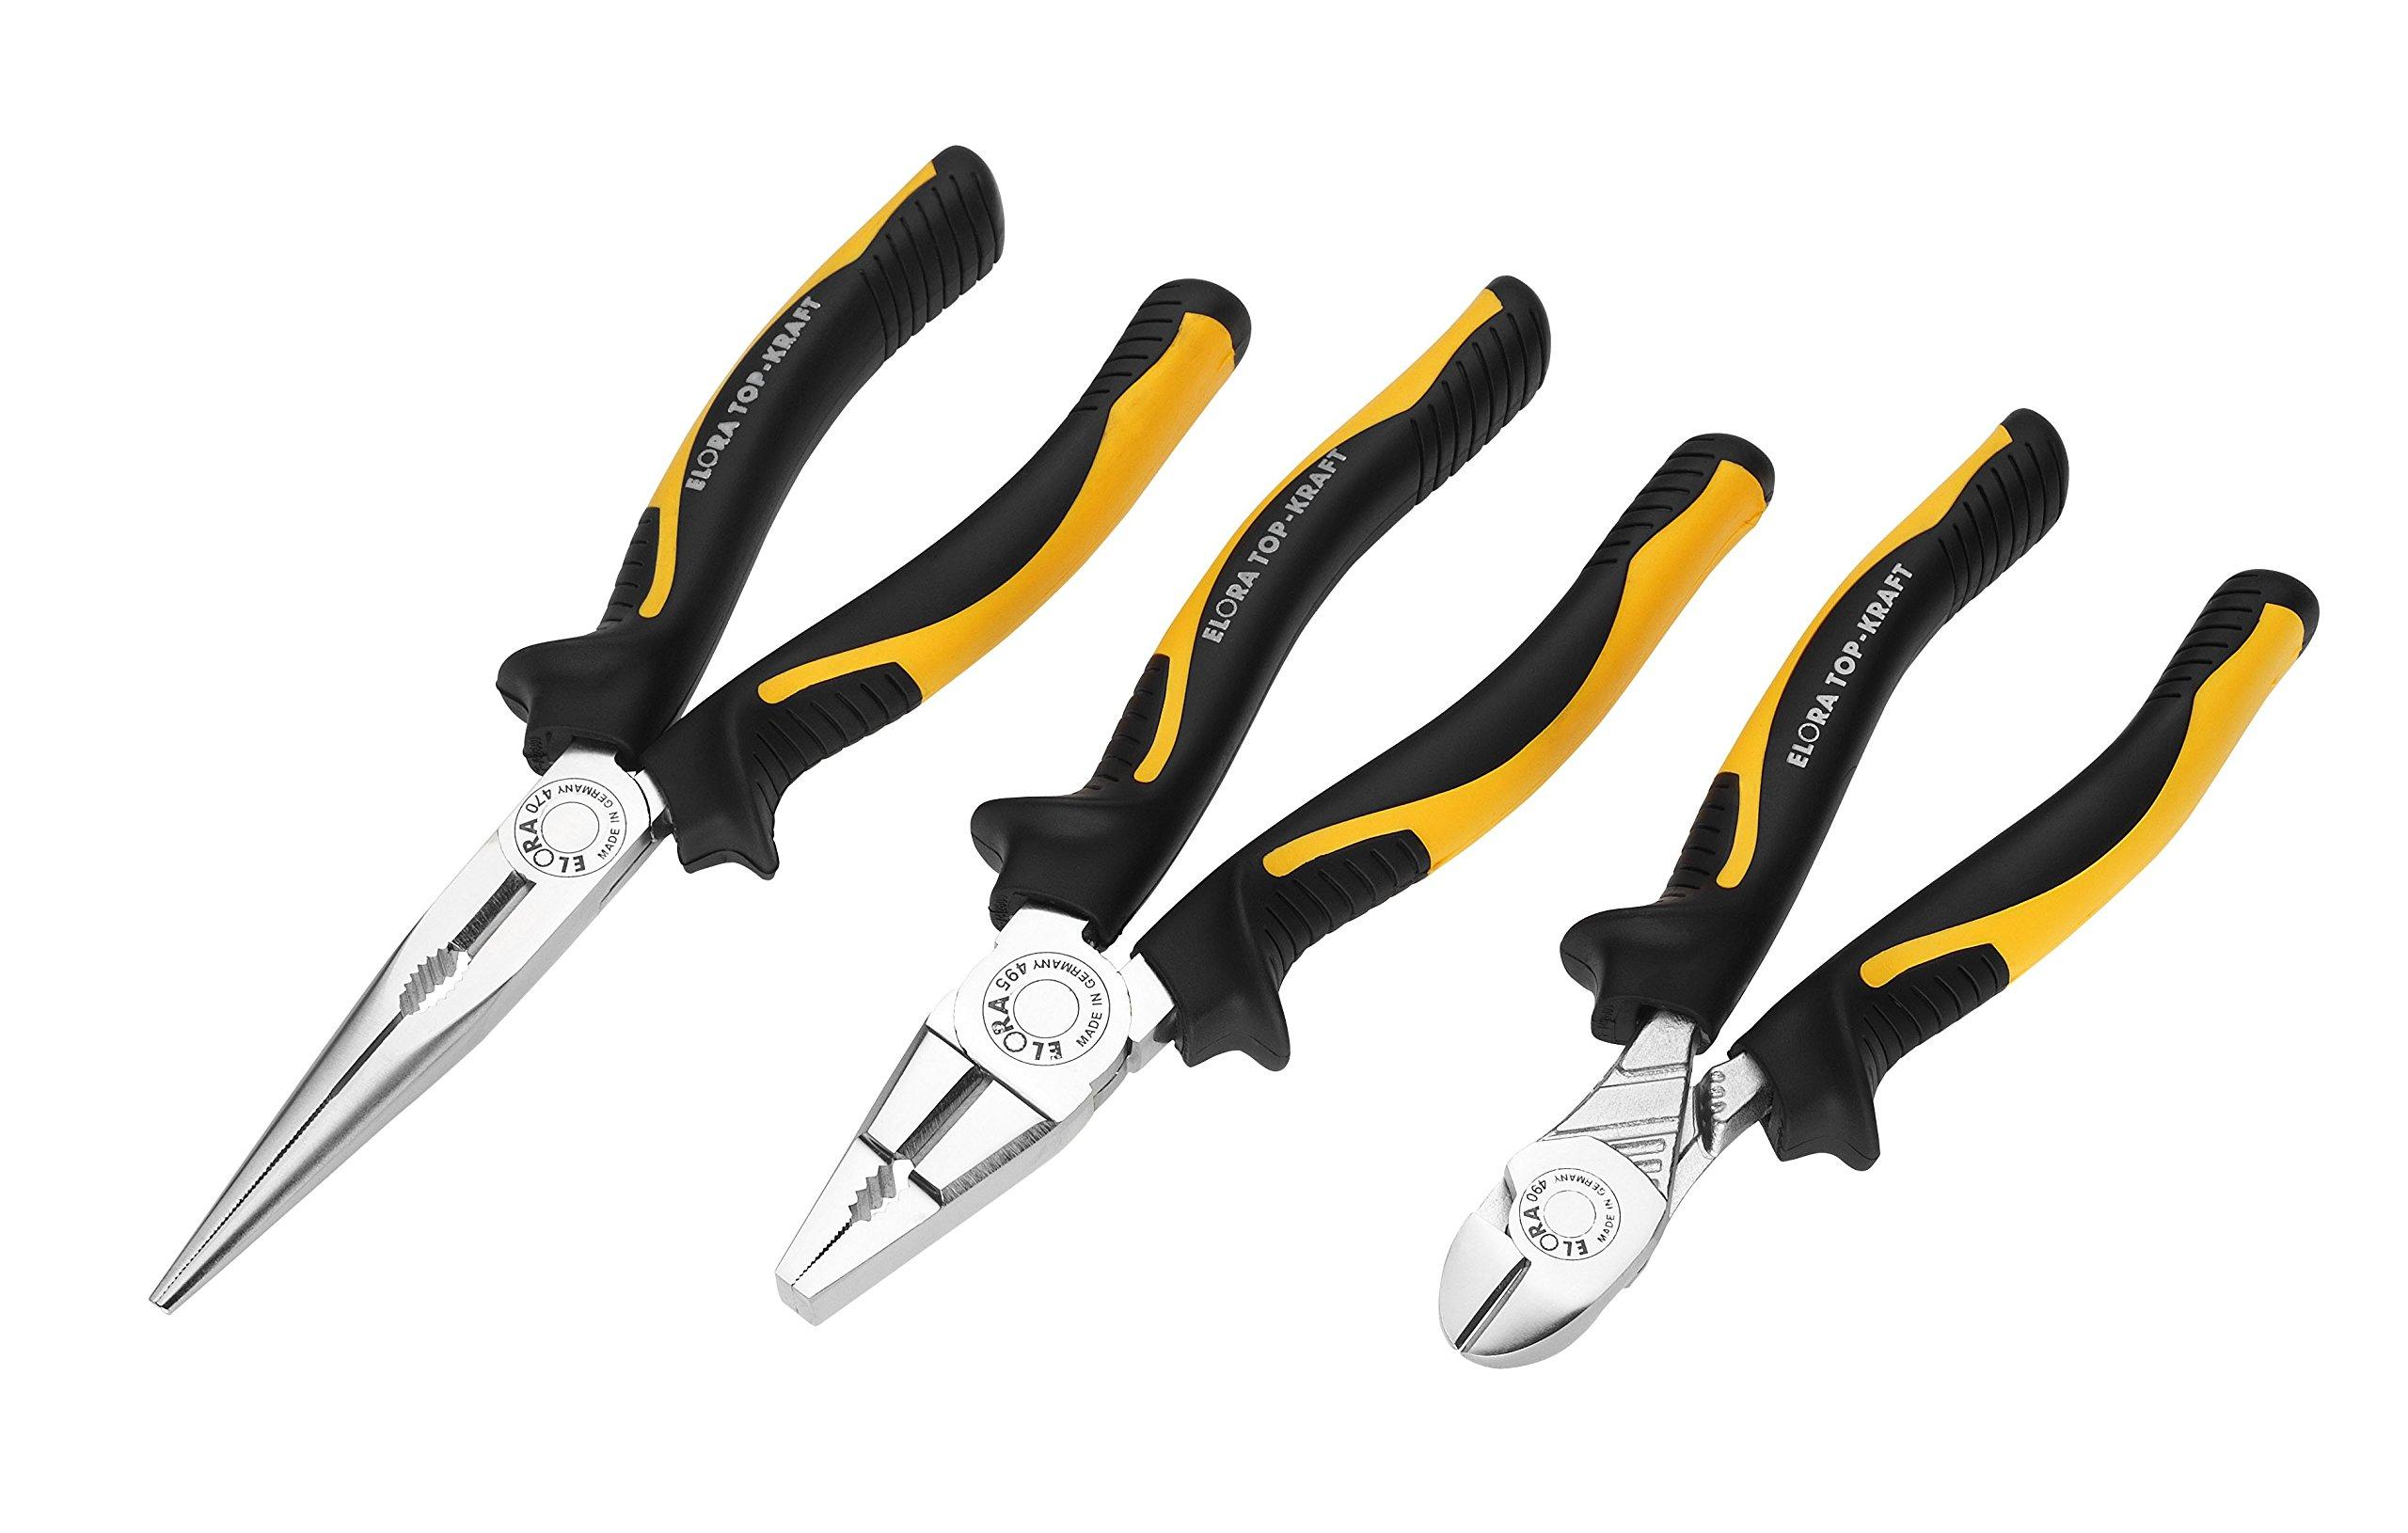 Elora 404500301000 Mechanic's pliers set with 2C-handles (3 piece)